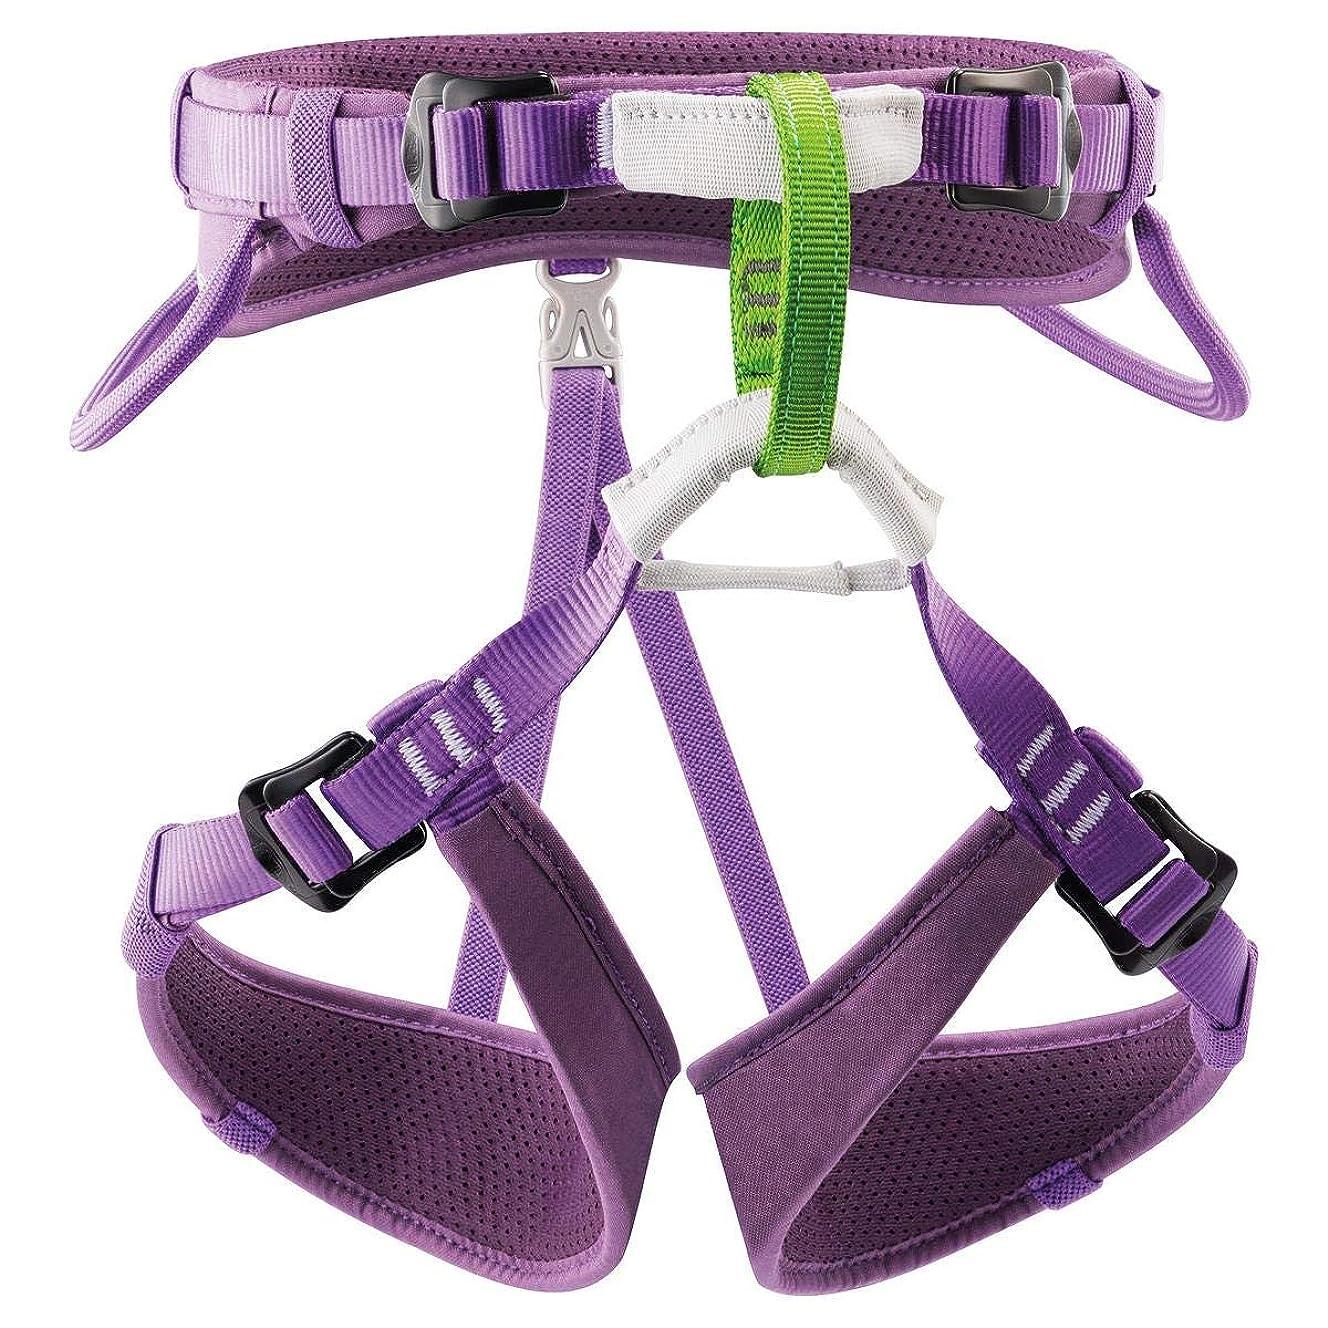 PETZL Macchu Kids' Climbing Harness, Raspberry